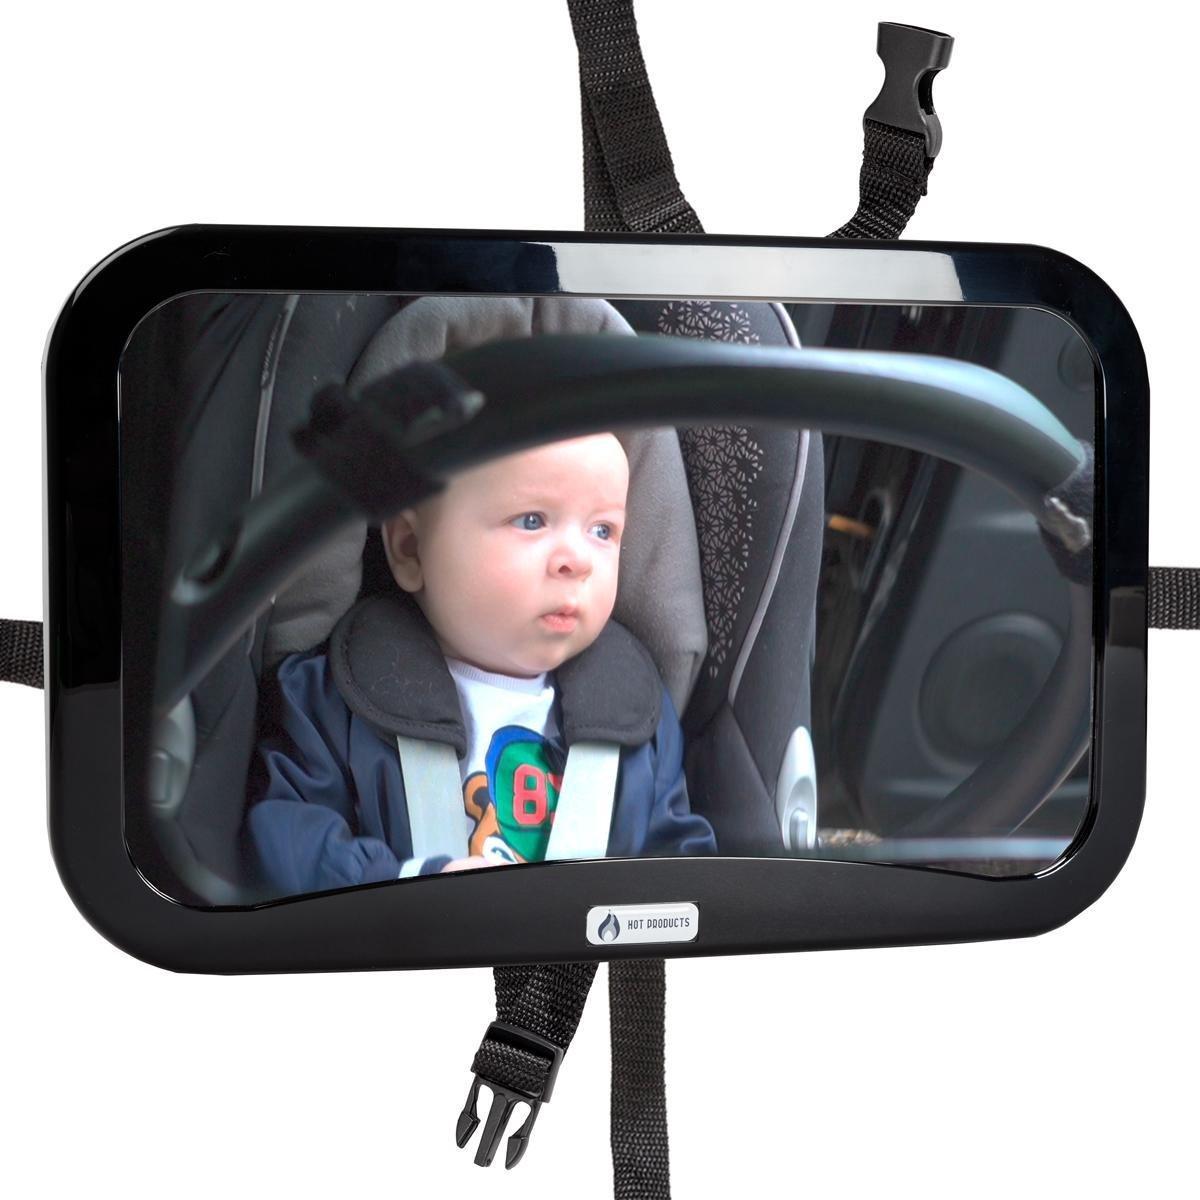 Autospiegel baby - verstelbare spiegel hoofdsteun autostoel achterbank - veiligheidsspiegel - baby e